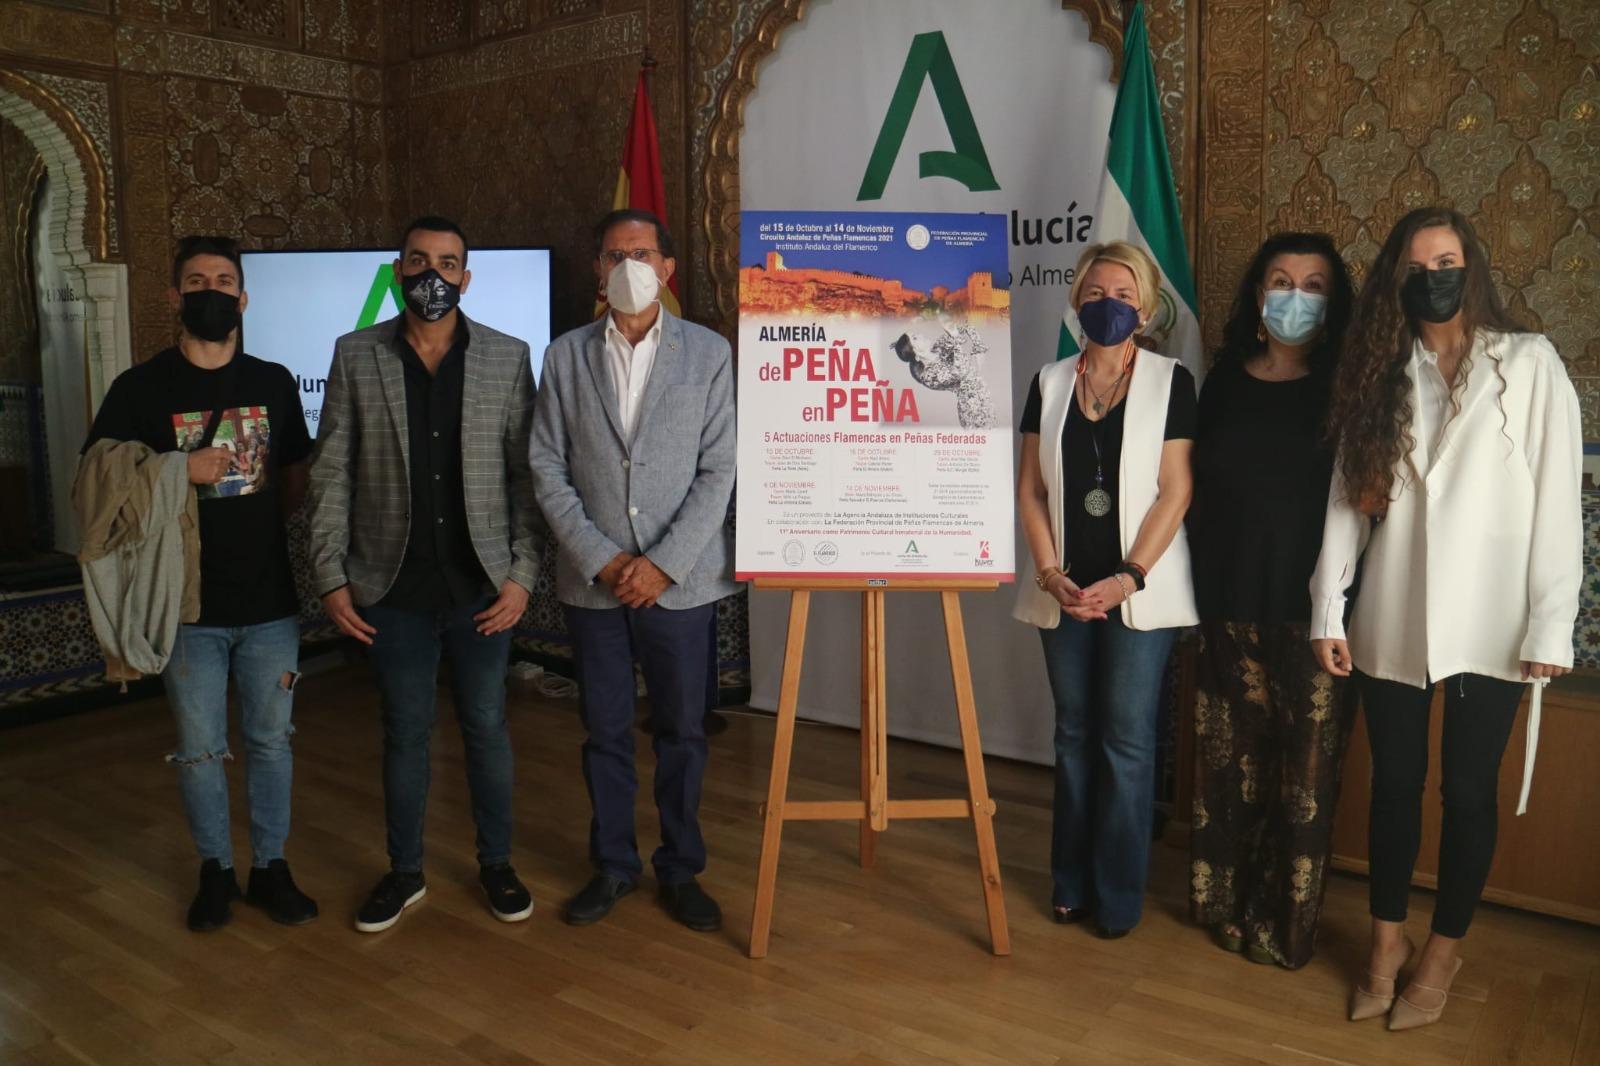 Presentación Circuito Provincial Almería Flamenca 'De Peña en 'Peña' 2021